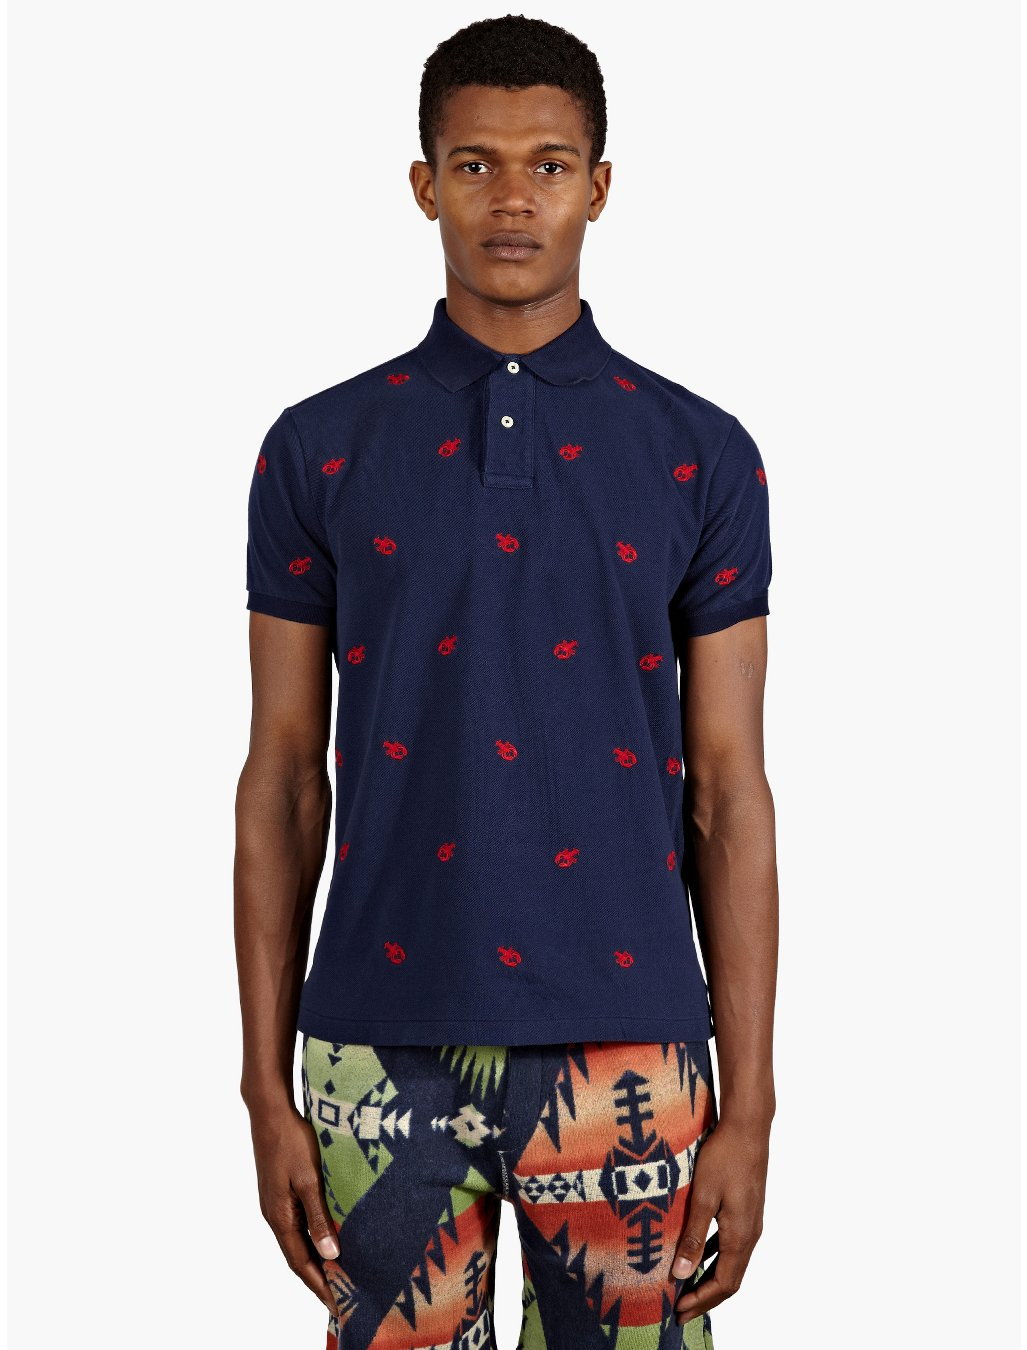 Polo ralph lauren mens navy lobster embroidered polo shirt for Mens navy polo shirt